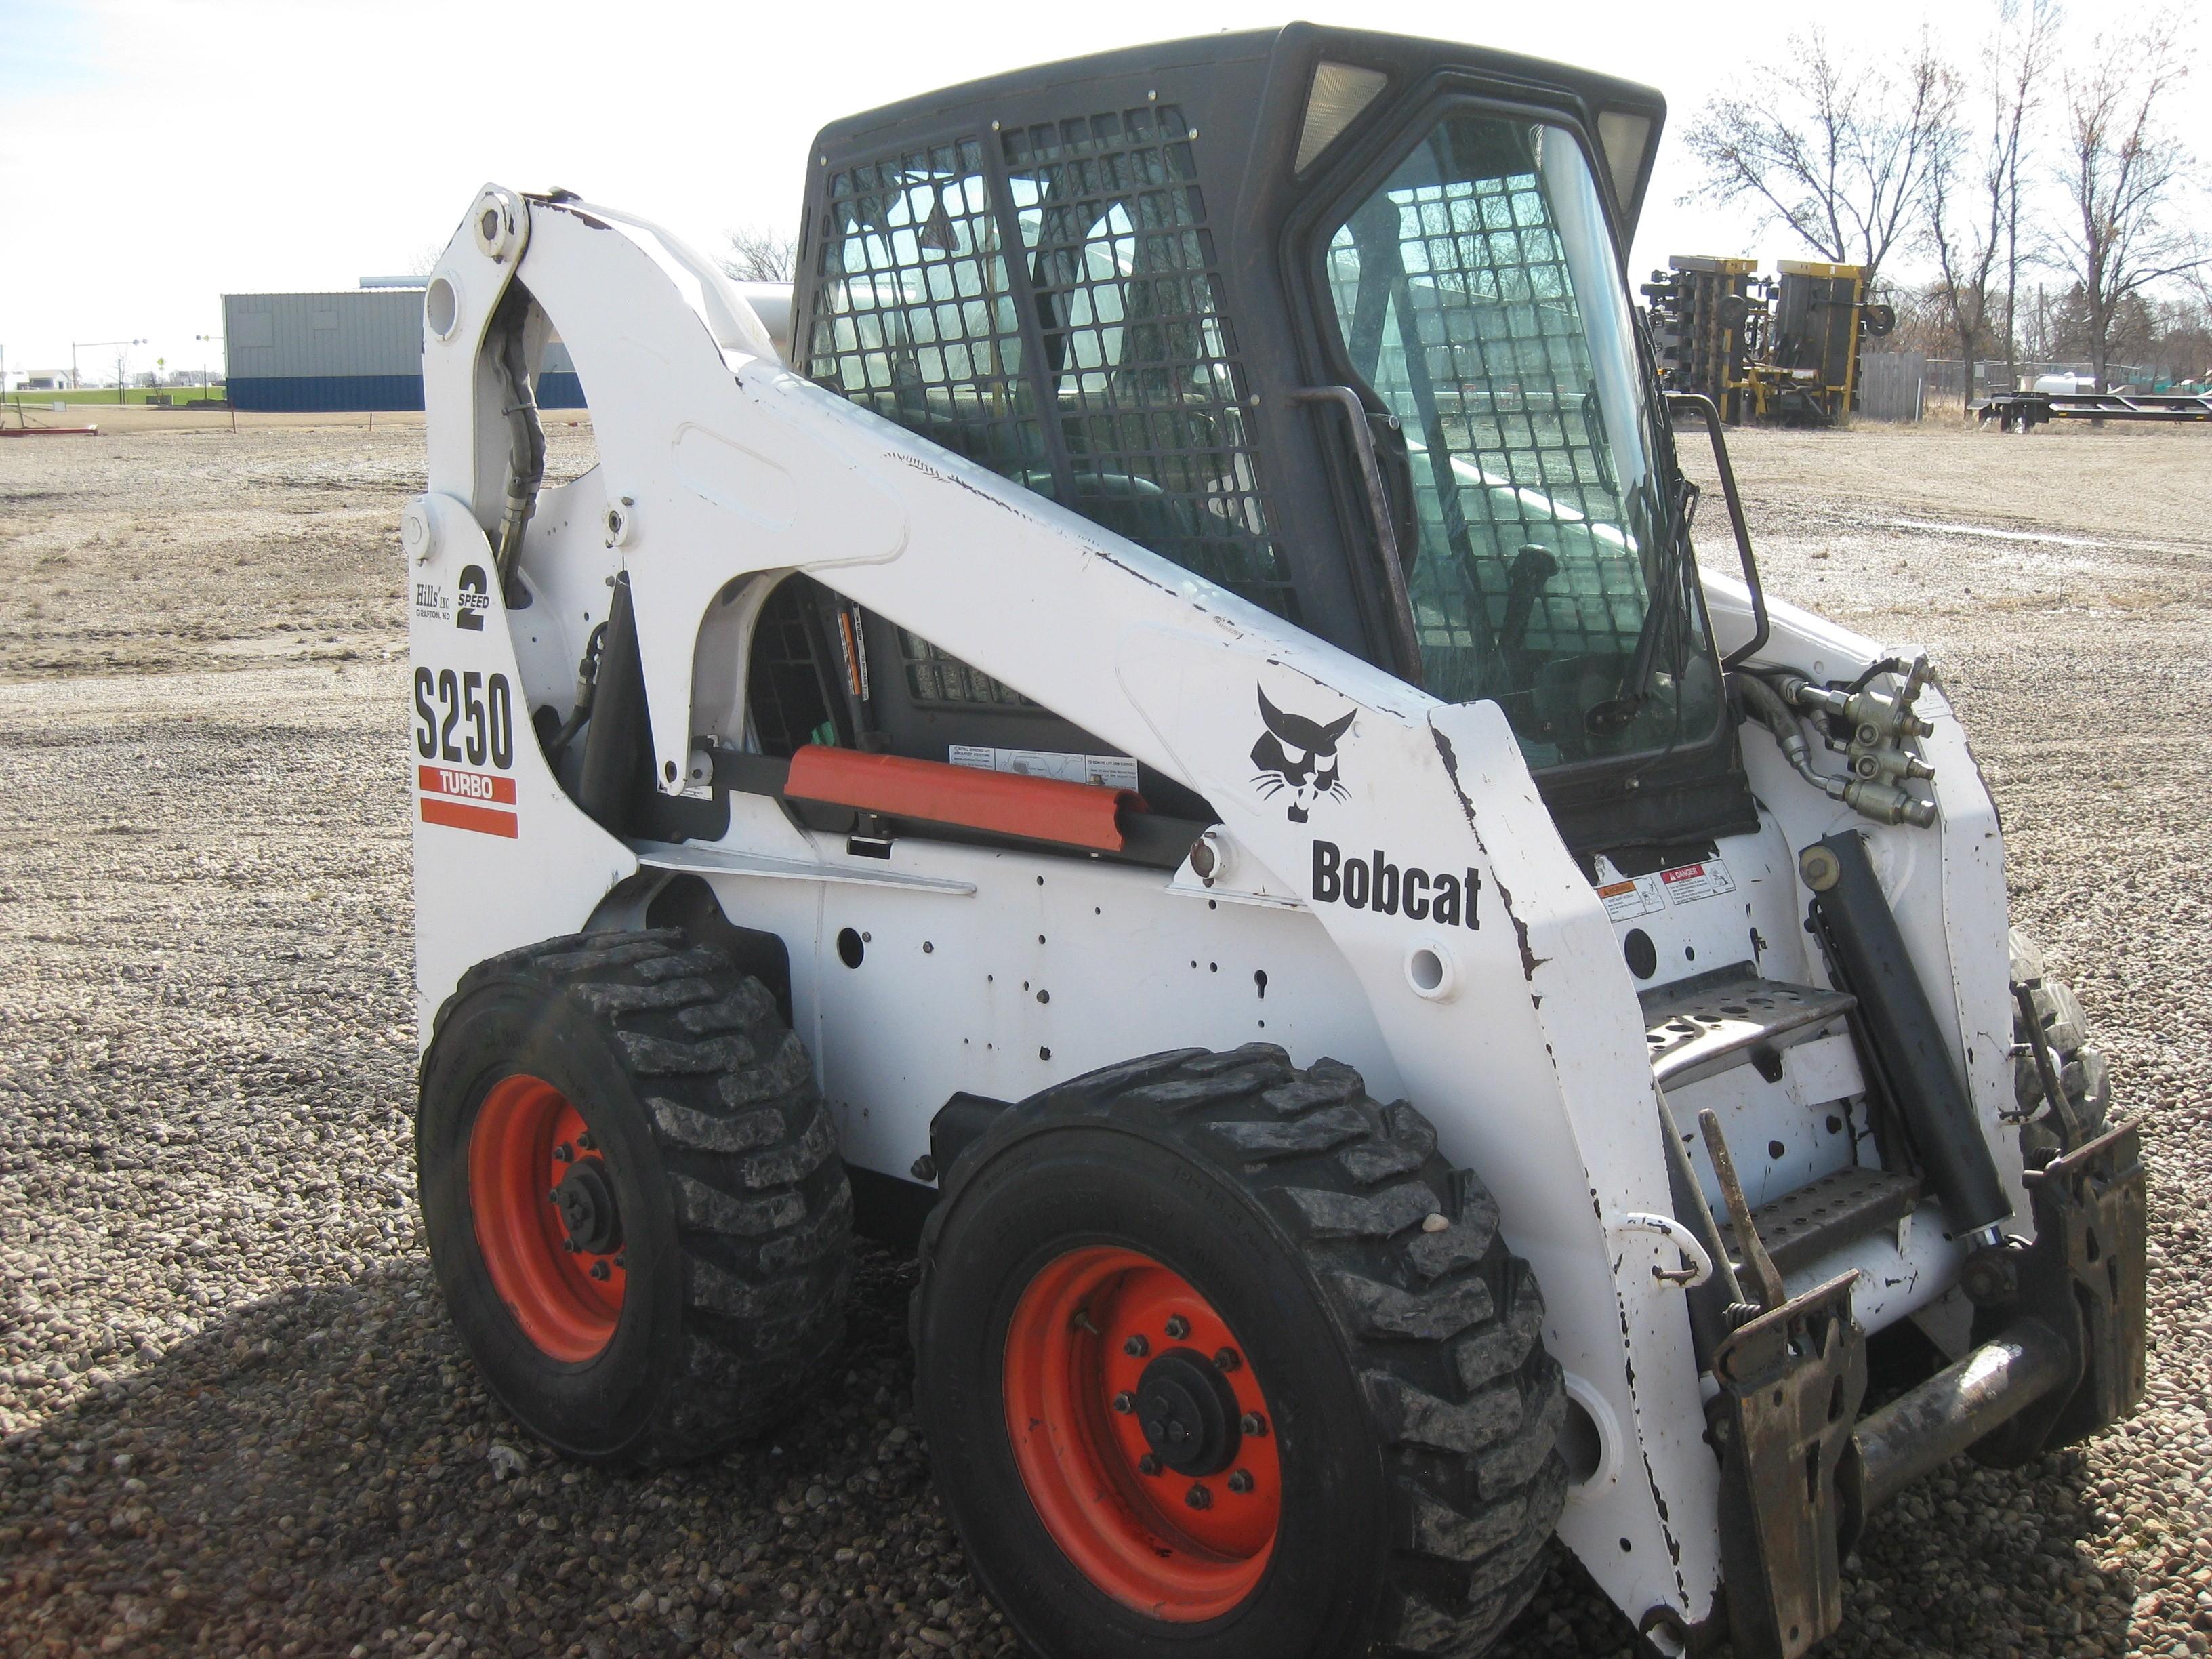 Used, 2004, Bobcat, S250, Skid Steers